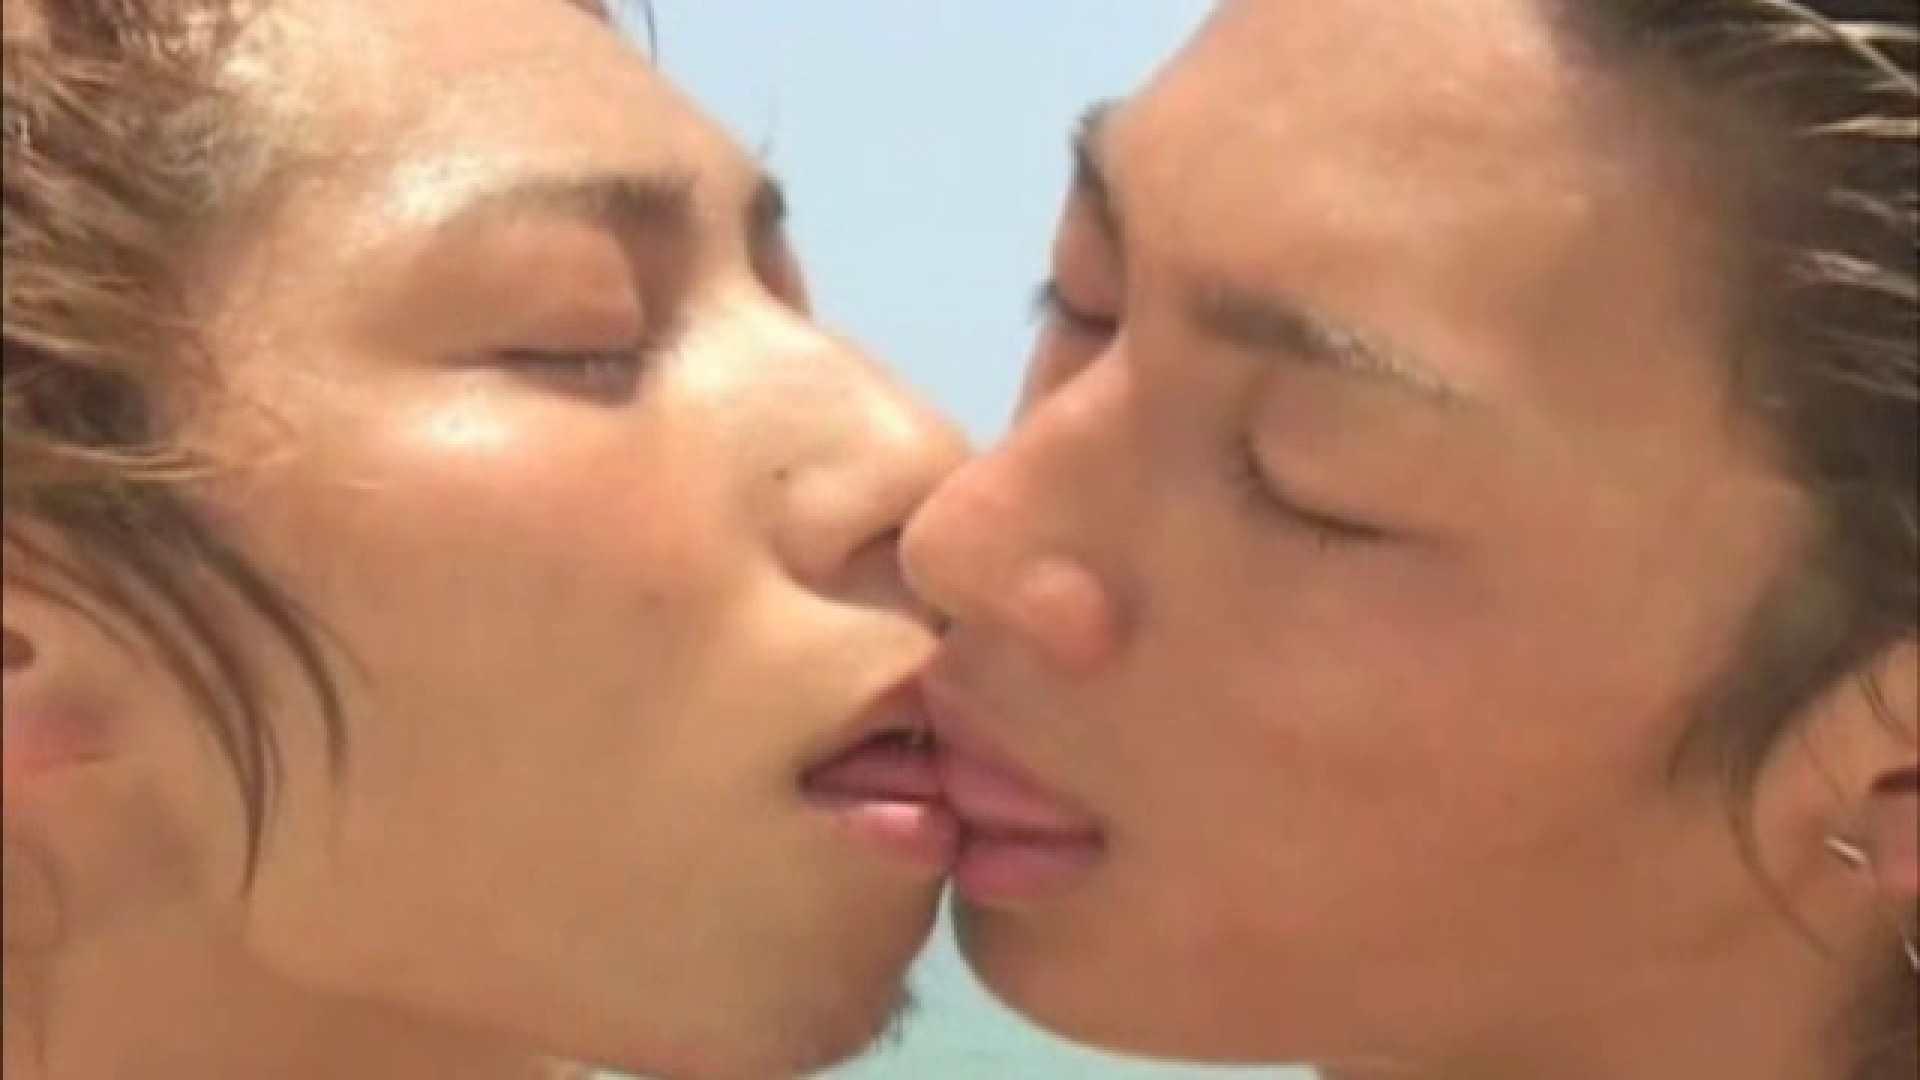 南国青春白書 本当の俺 vol.03 完全無修正 ゲイ射精画像 80画像 63